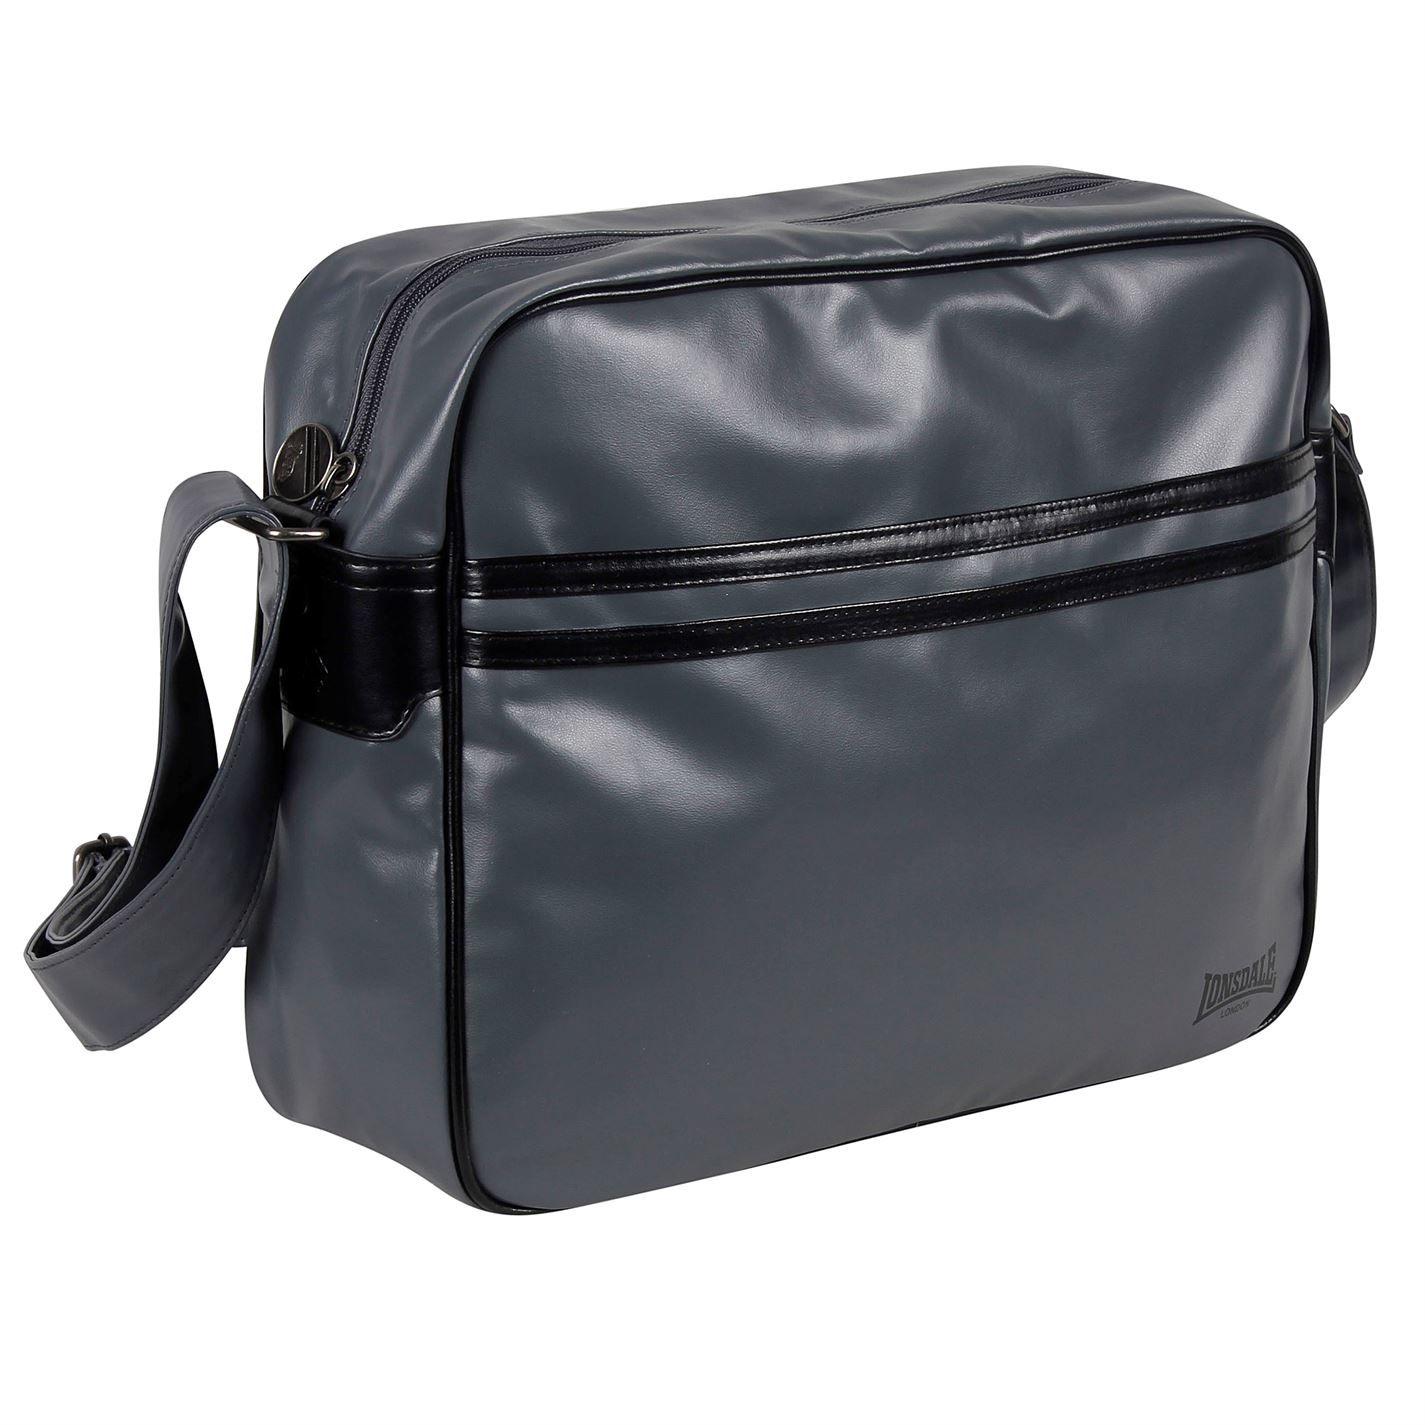 Lonsdale 2 Stripe Flight Bag Messenger Bags